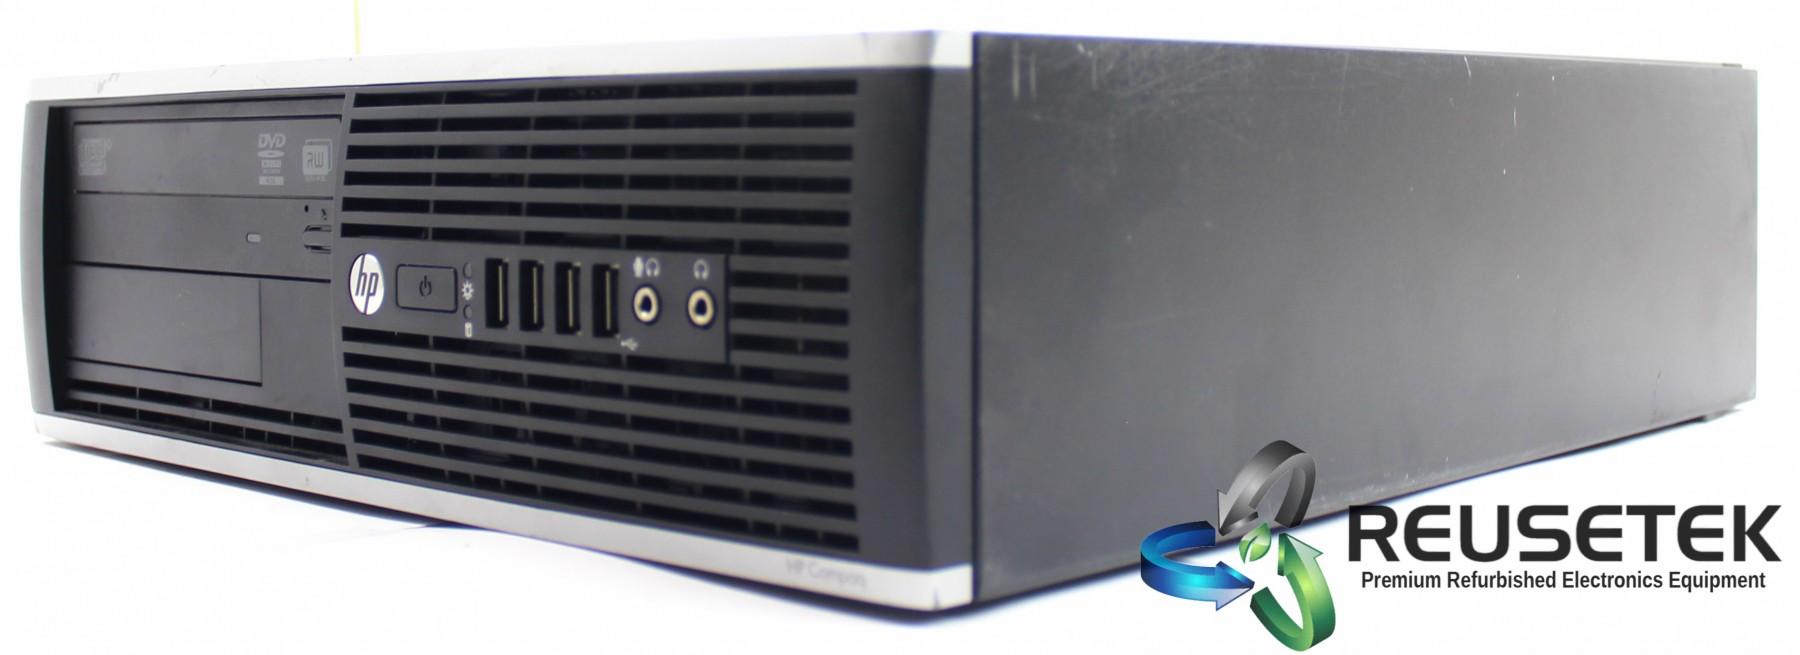 500030686-Refurbished HP Compaq 8200 Elite Small Form Factor Desktop PC - 3.1GHZ Core i5 6GB 500GB Business Desktop-image